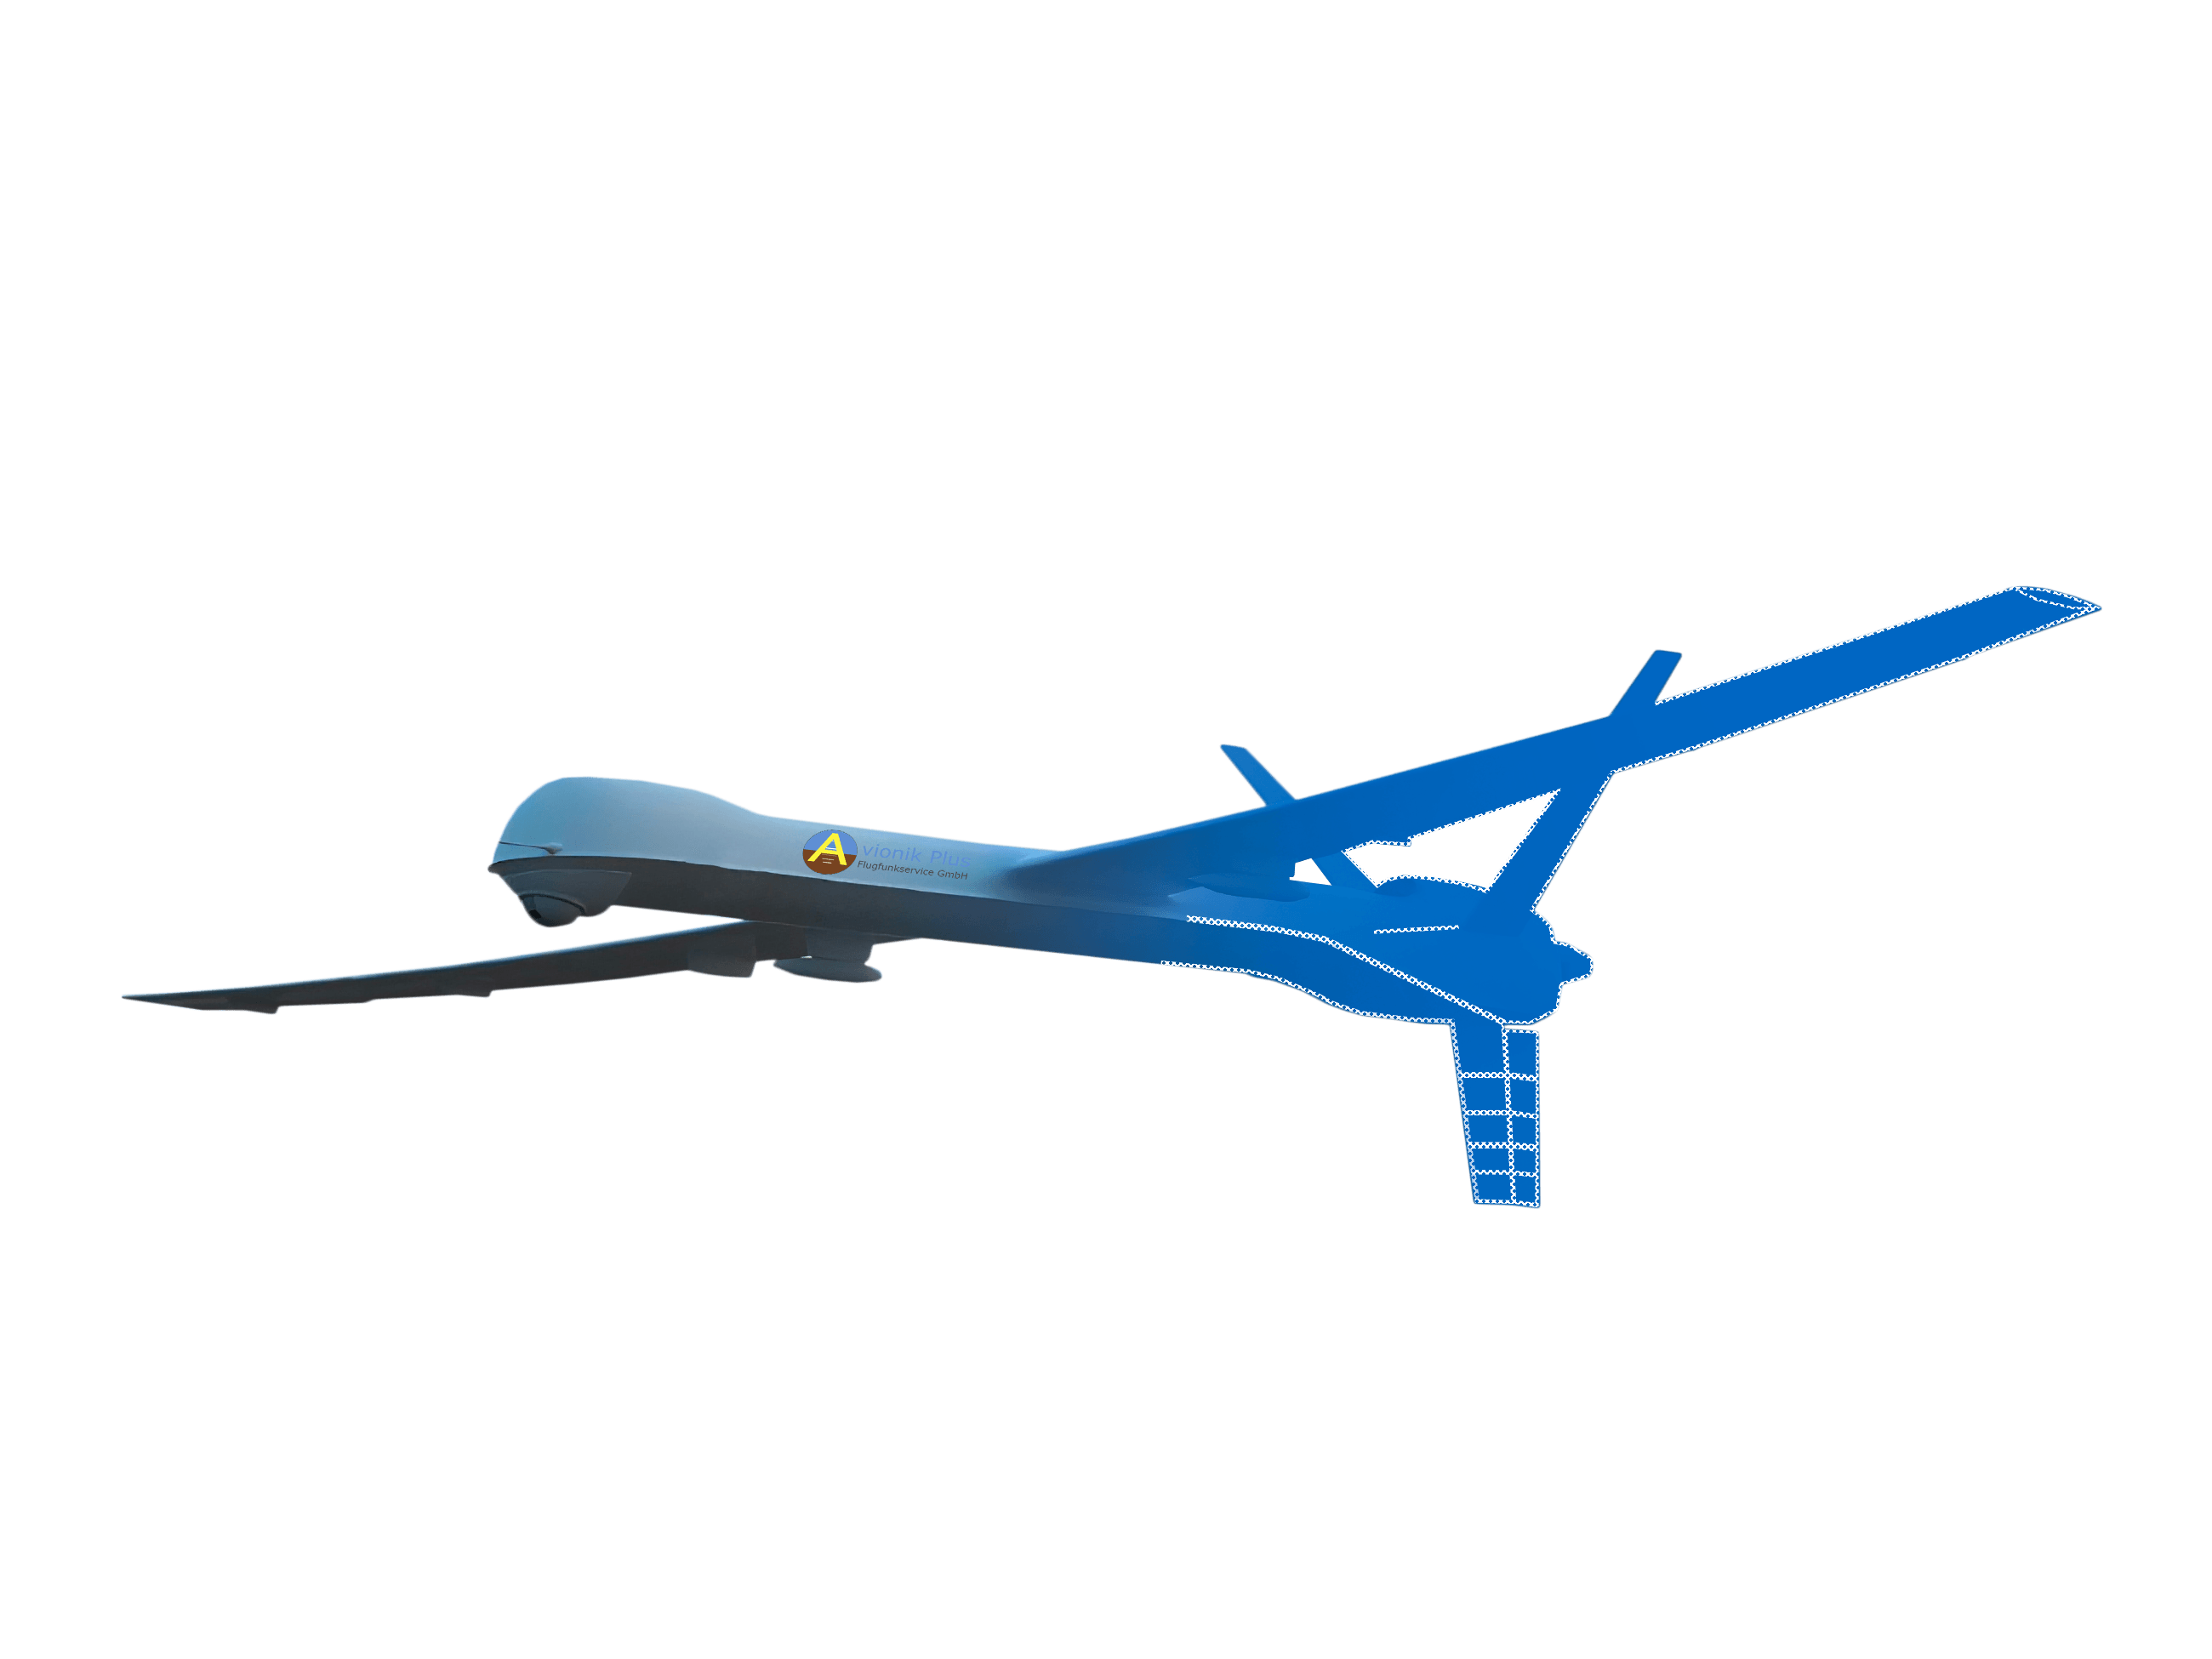 Projekte Avionik Plus Robotic Skies Avionik General Aviation Projekt Modernisierung Umbau